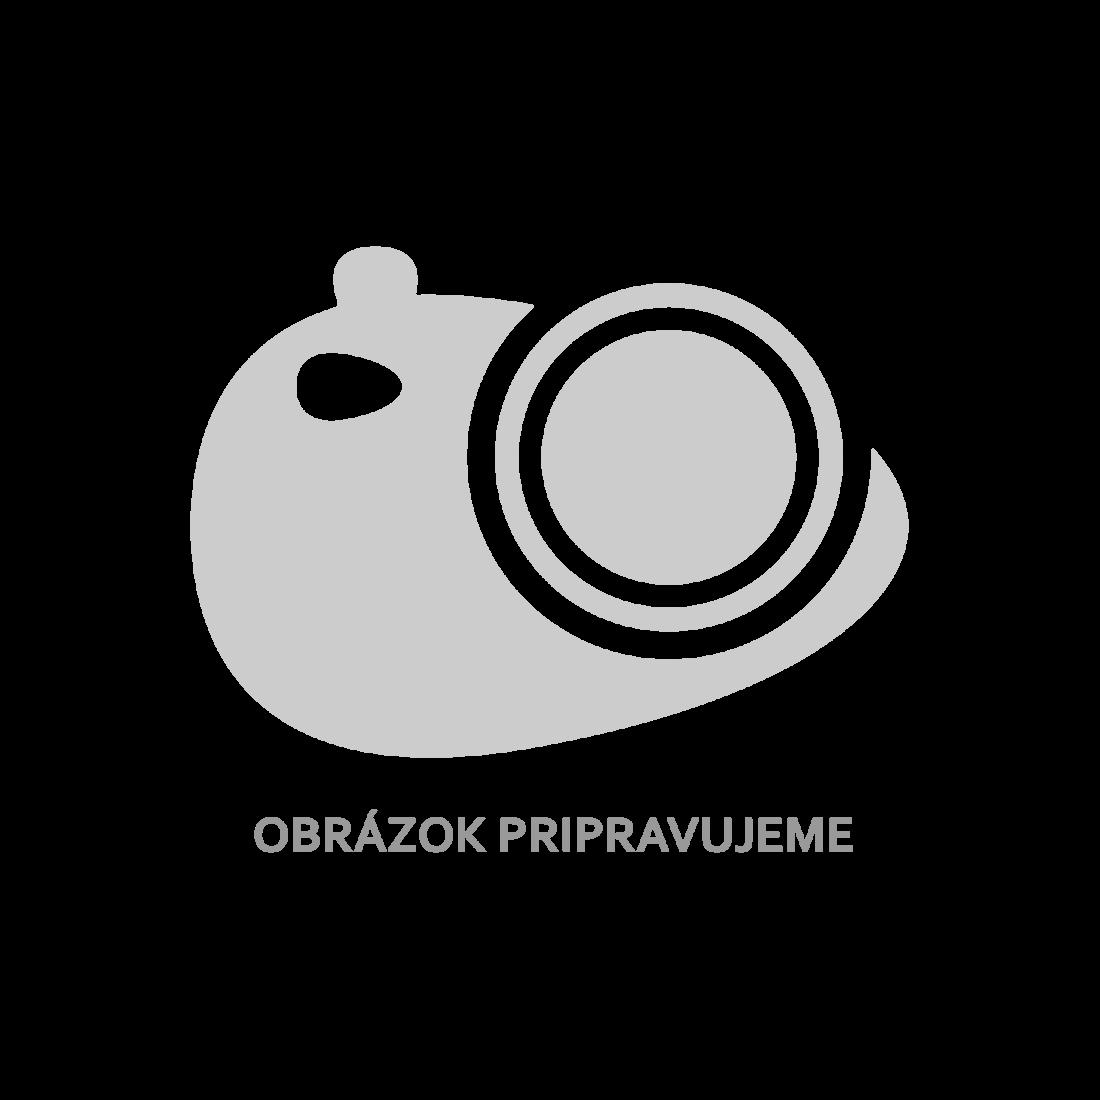 vidaXL Zahradní stůl stříbrný 120 x 60 x 70 cm hliník [48717]